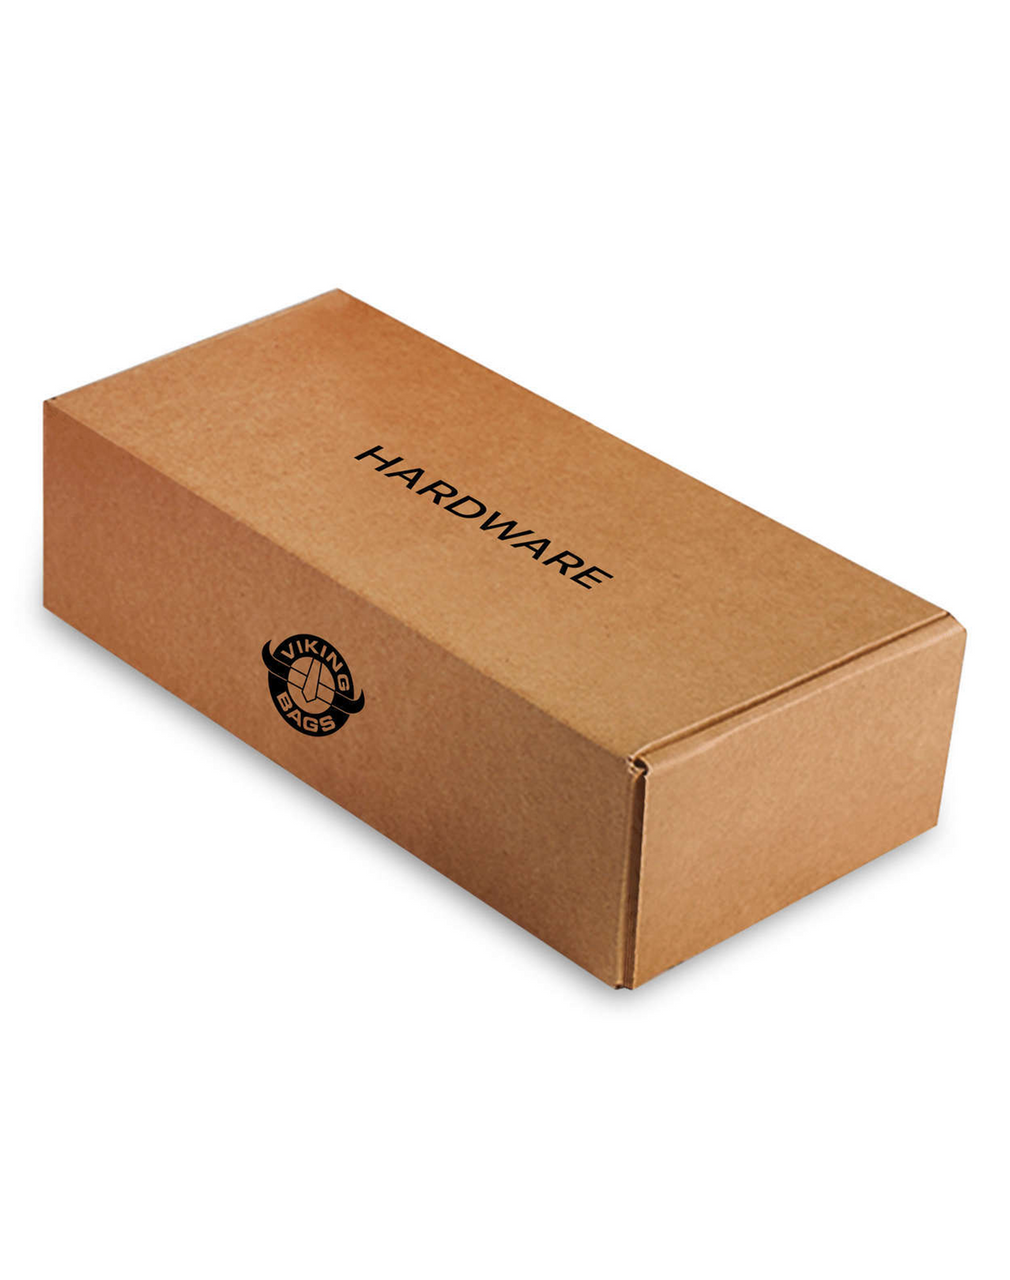 Honda 600 Shadow VLX Viking Lamellar Large Black Hard Saddlebags box